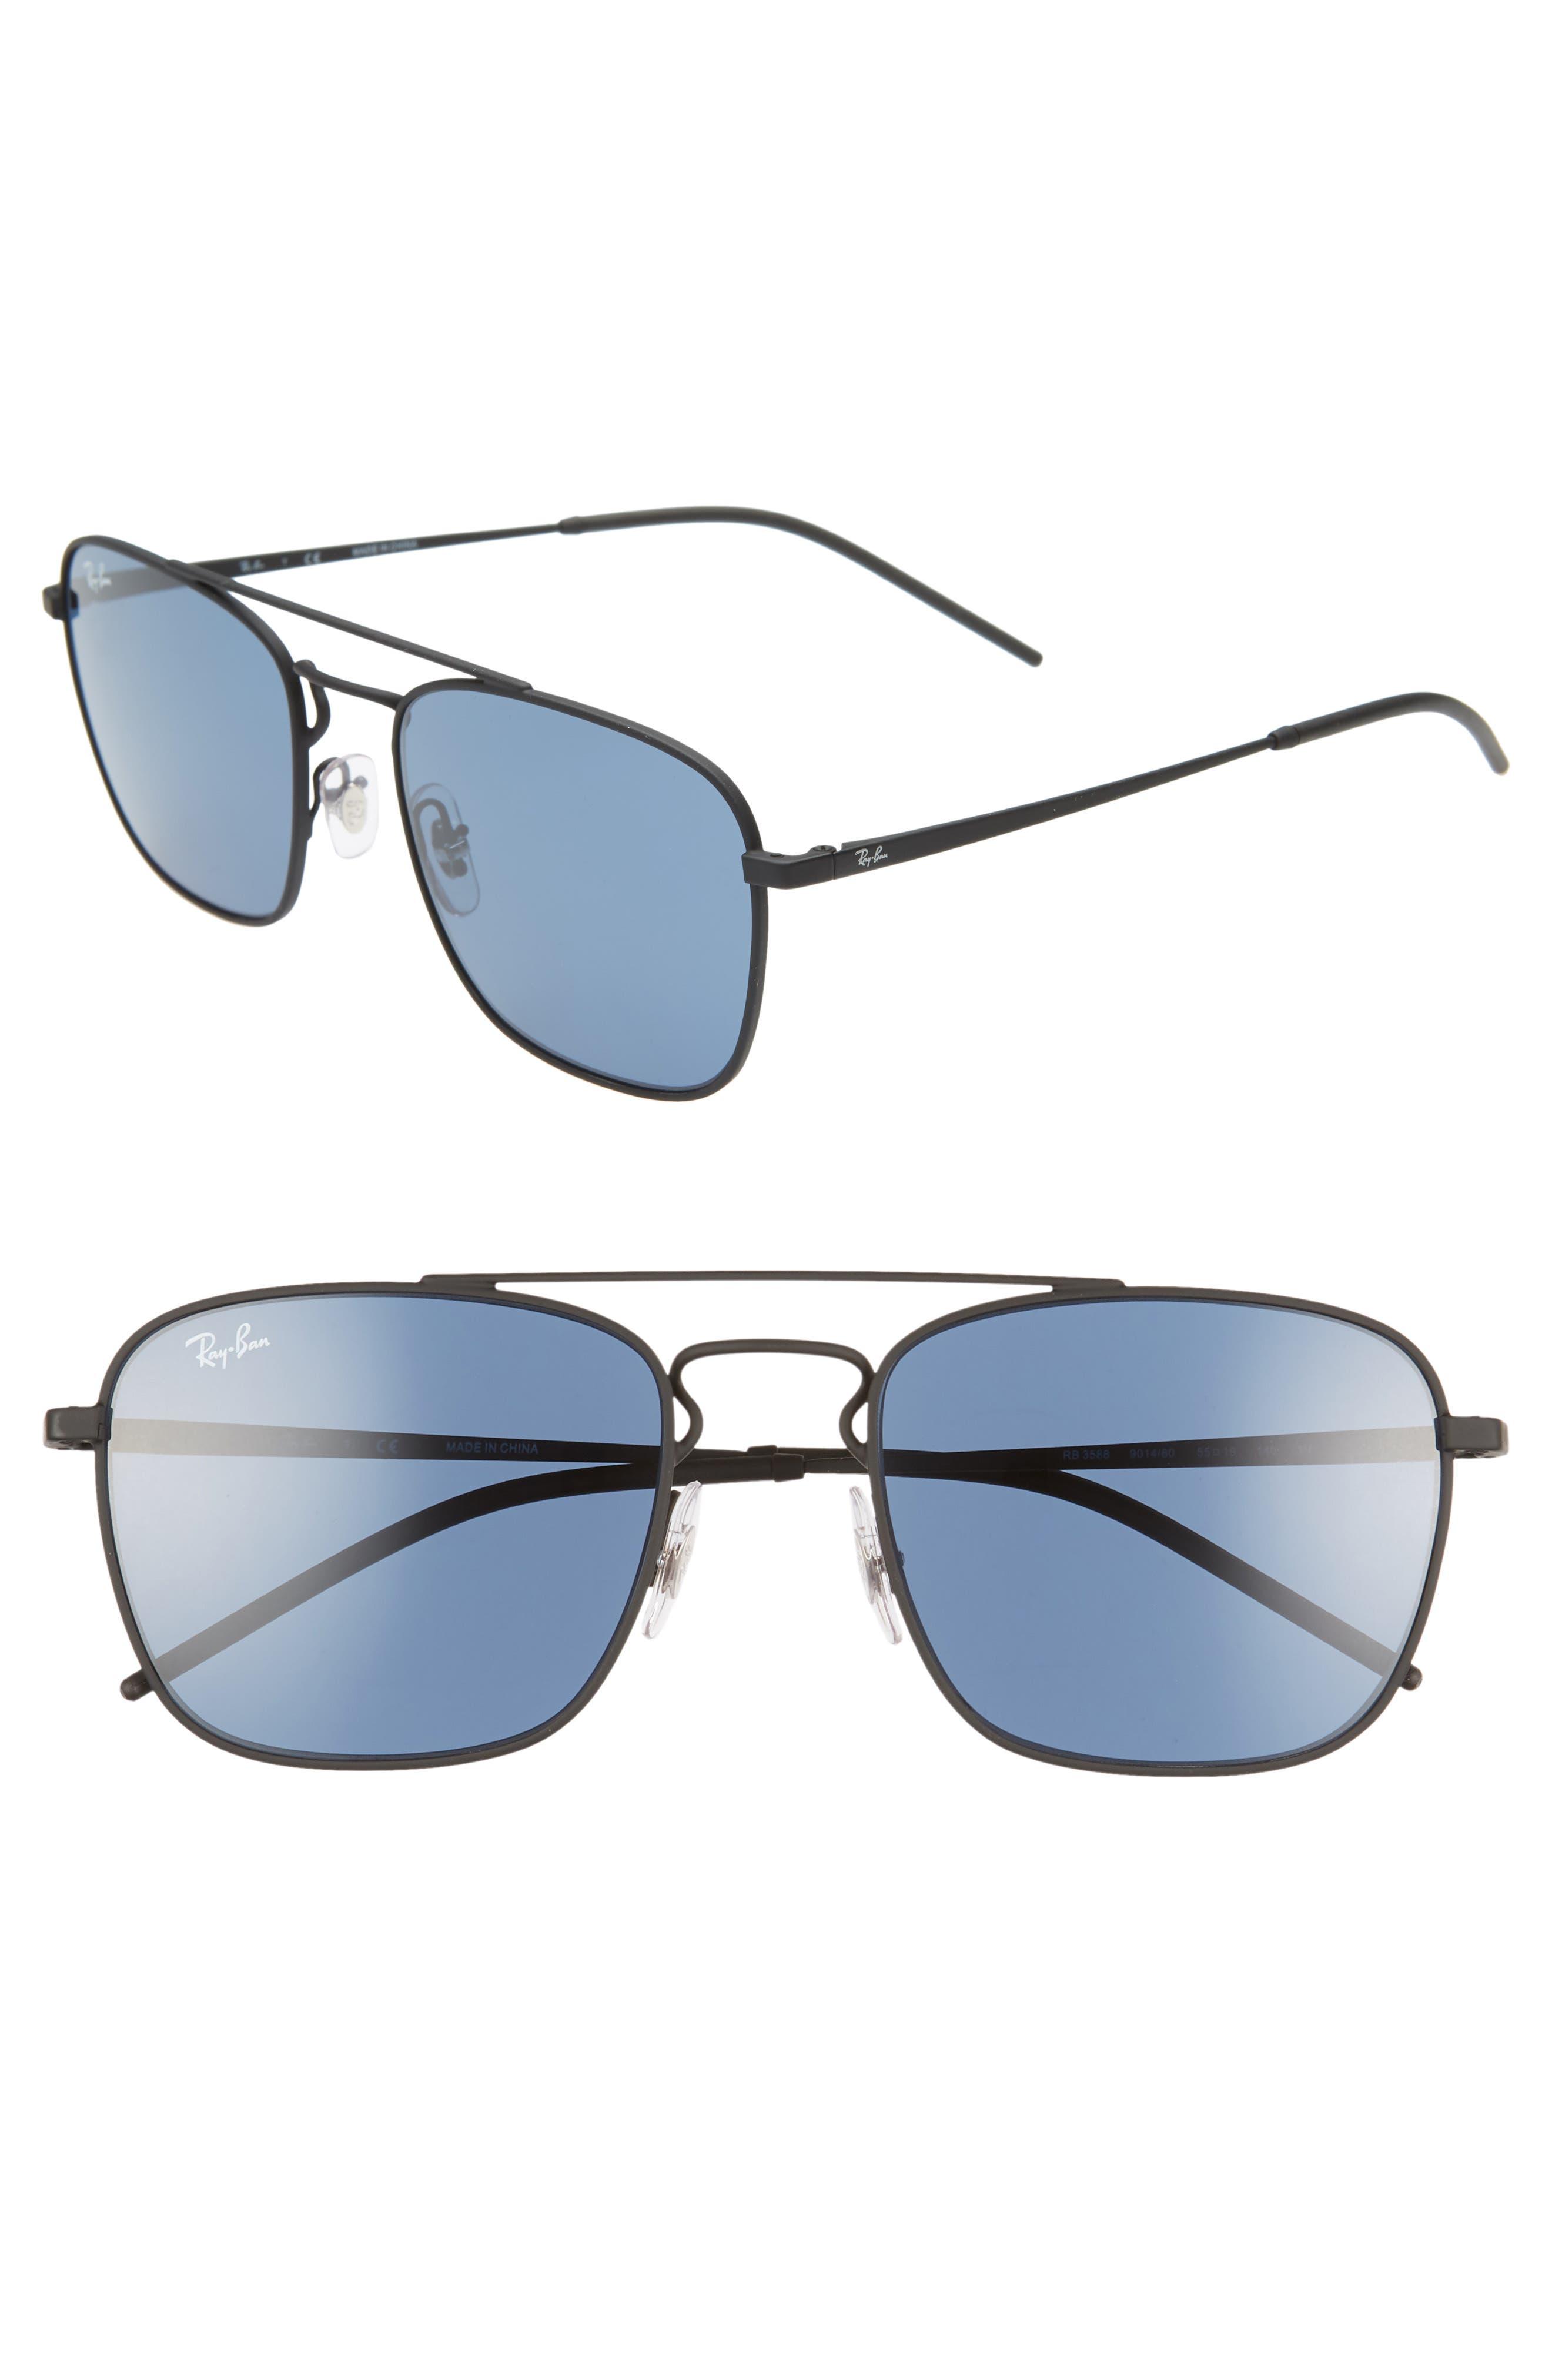 Ray-Ban 55Mm Navigator Sunglasses - Black/ Blue Solid